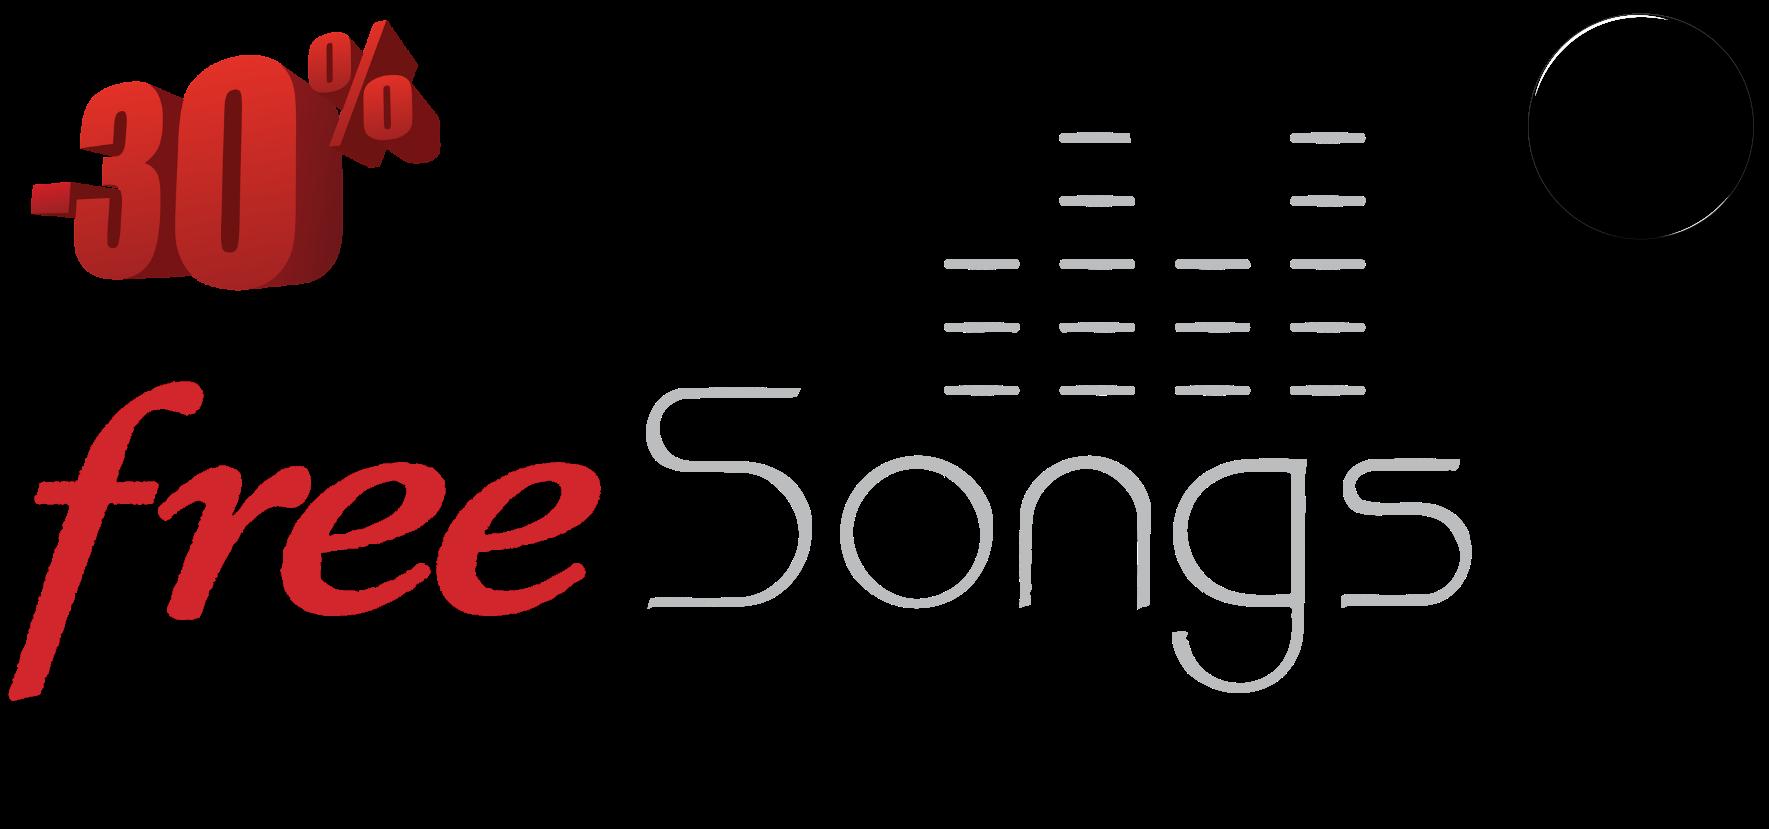 FreeSongs music